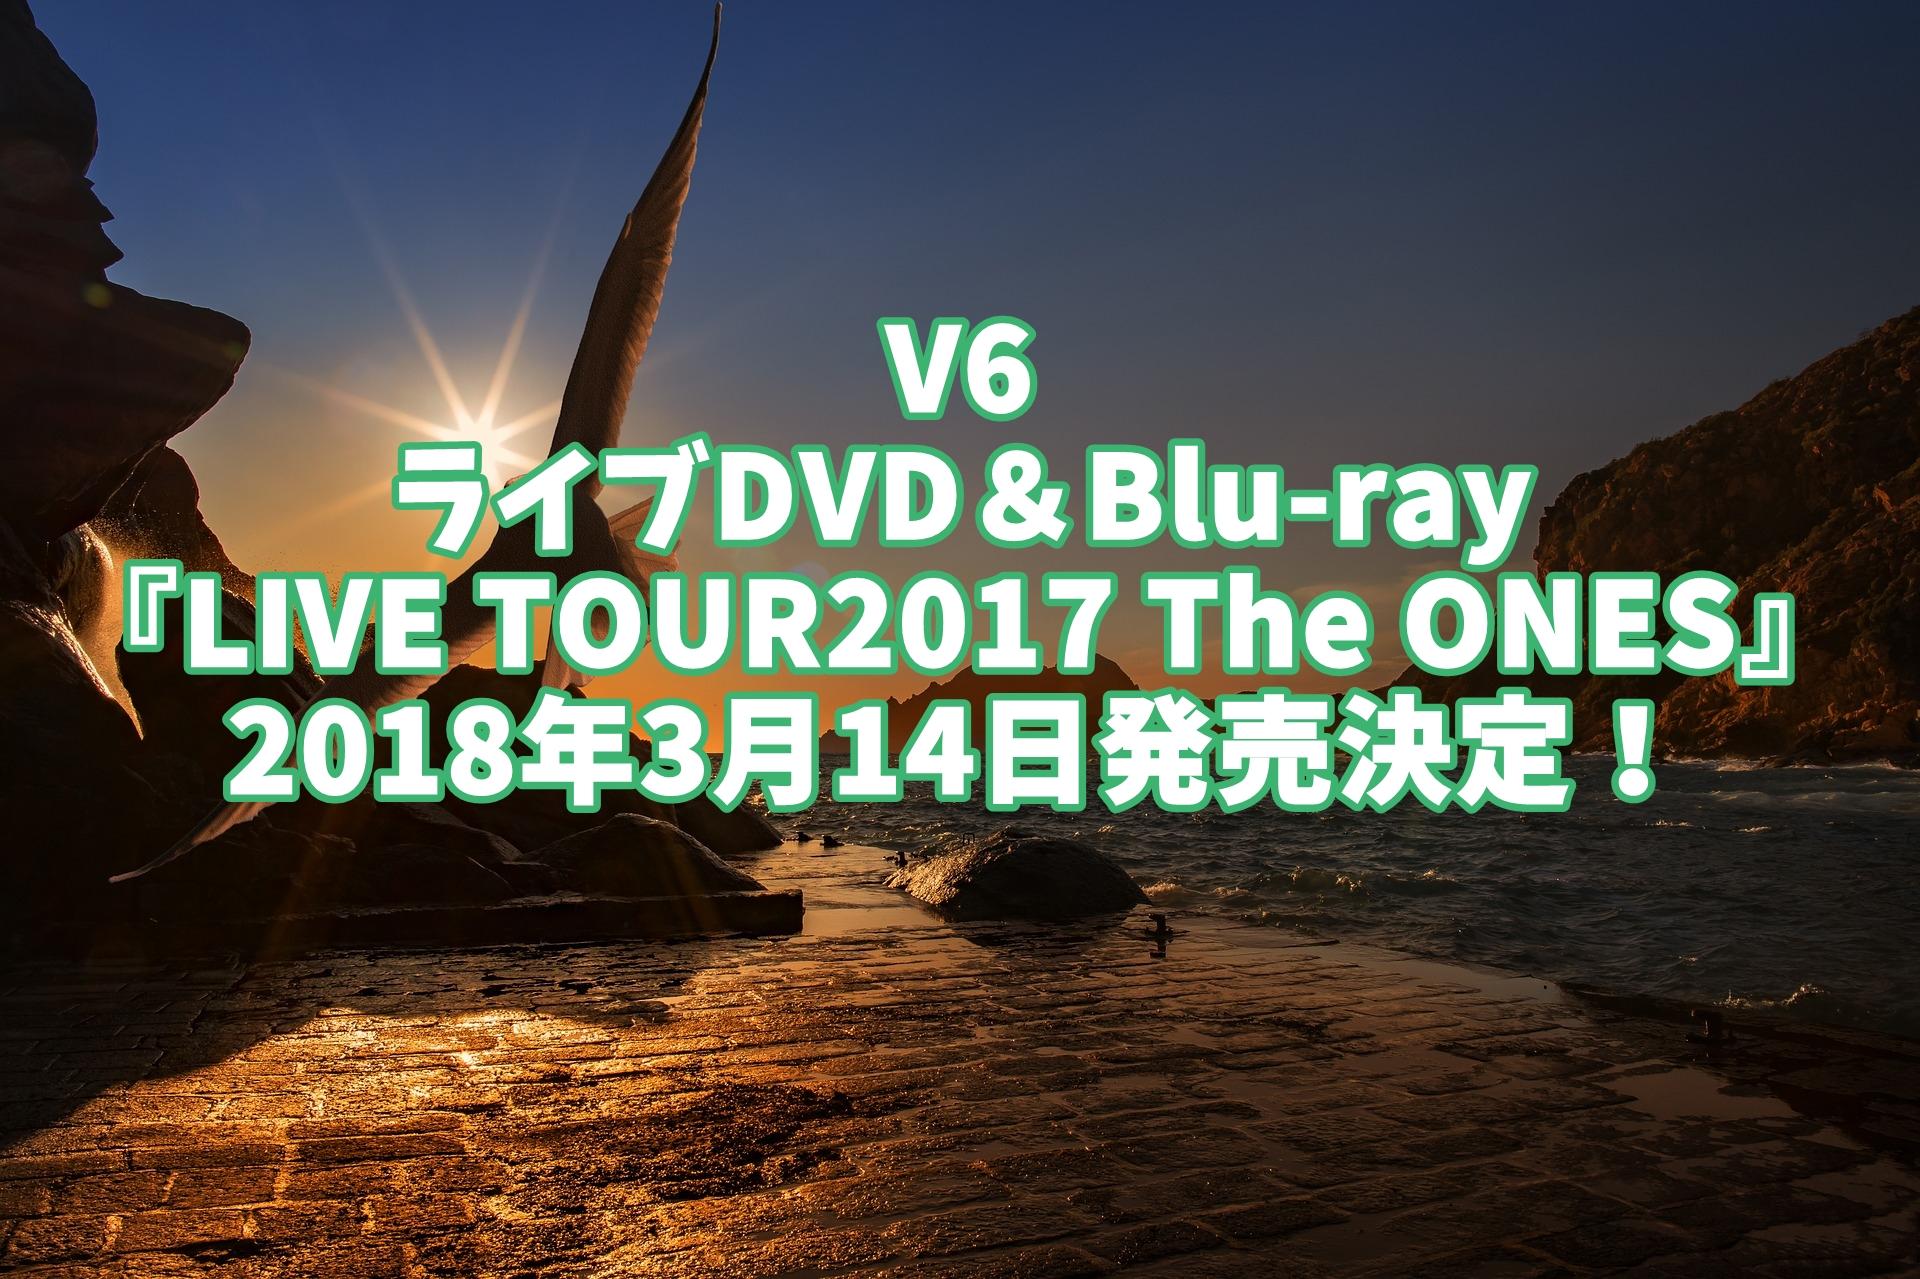 V6ライブDVD予約、特典案内!最新『LIVE TOUR2017 The ONES』最安値、収録曲など詳細